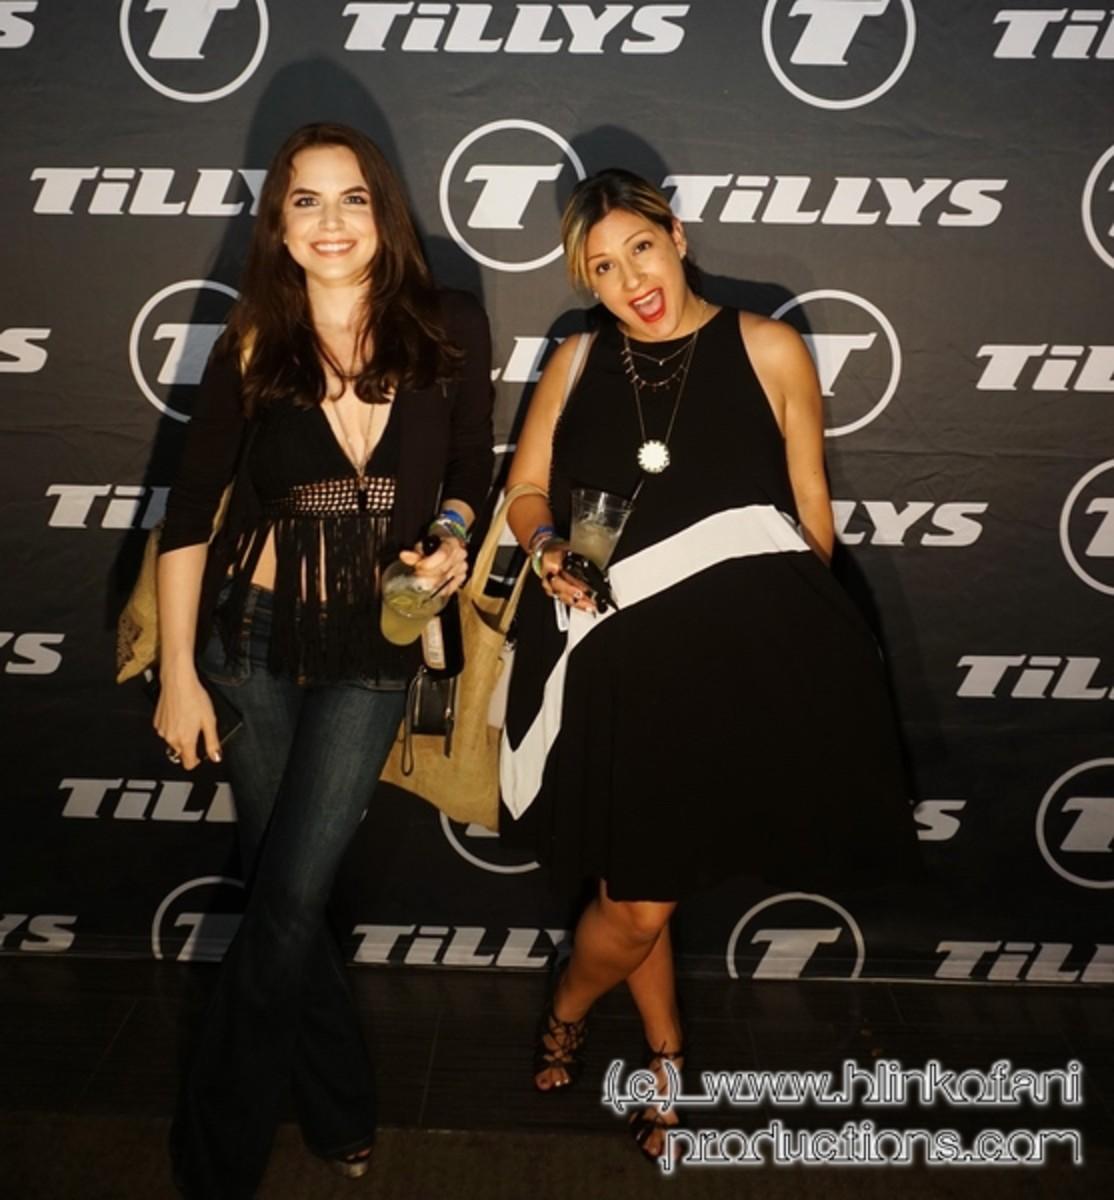 Team Fauxchella's: Kimberly Hall (KH) & Nicole Spiegel (NS)